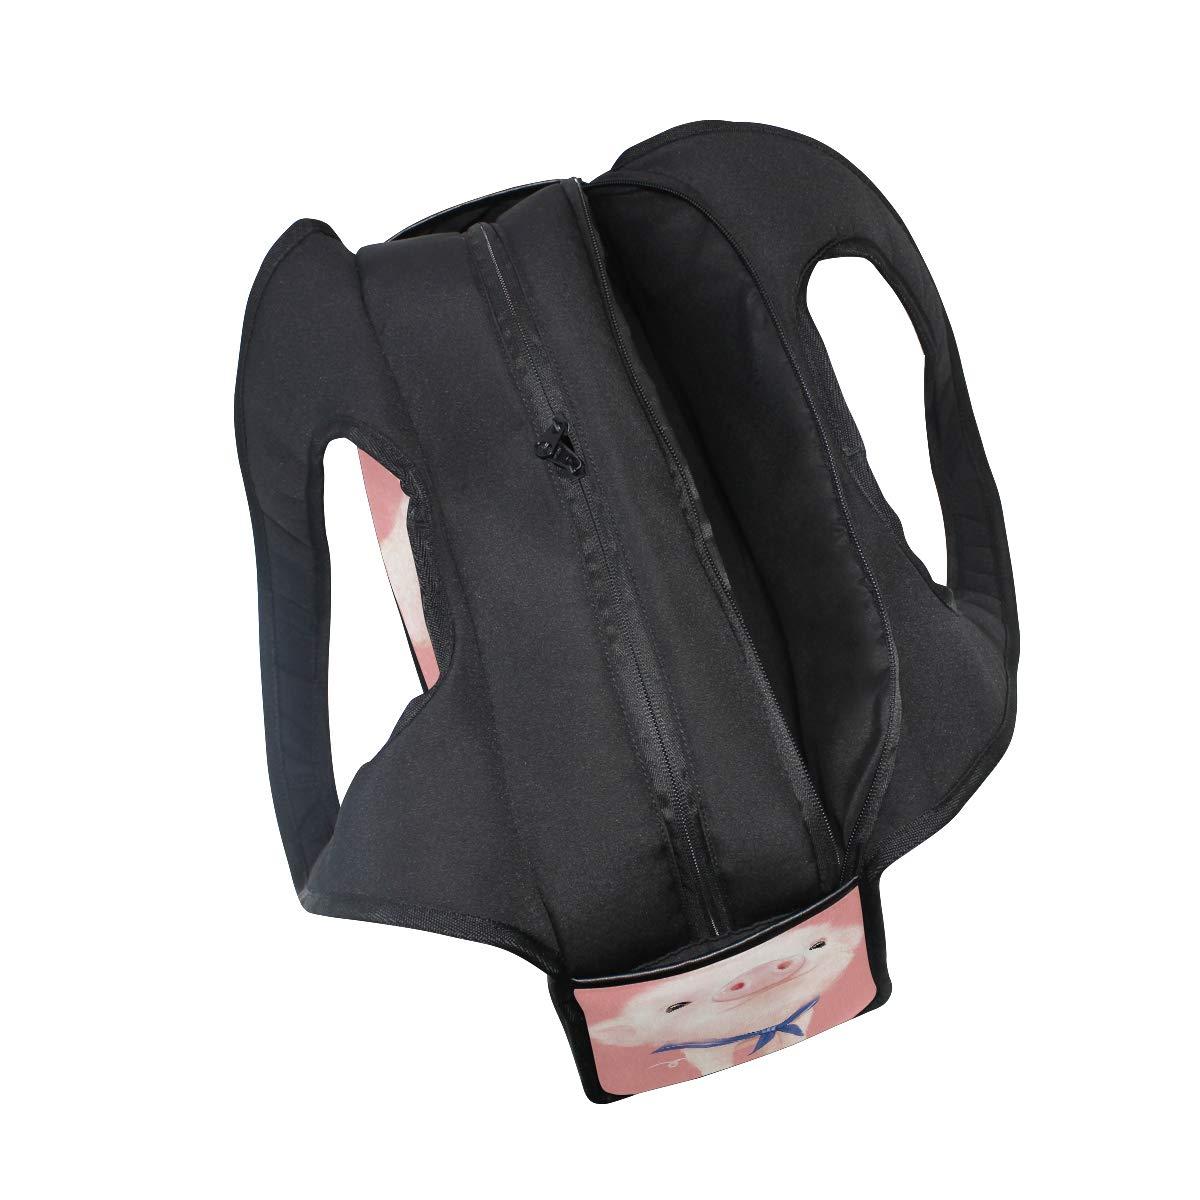 Cartoon Cute Pig Women Sports Gym Totes Bag Multi-Function Nylon Travel Shoulder Bag